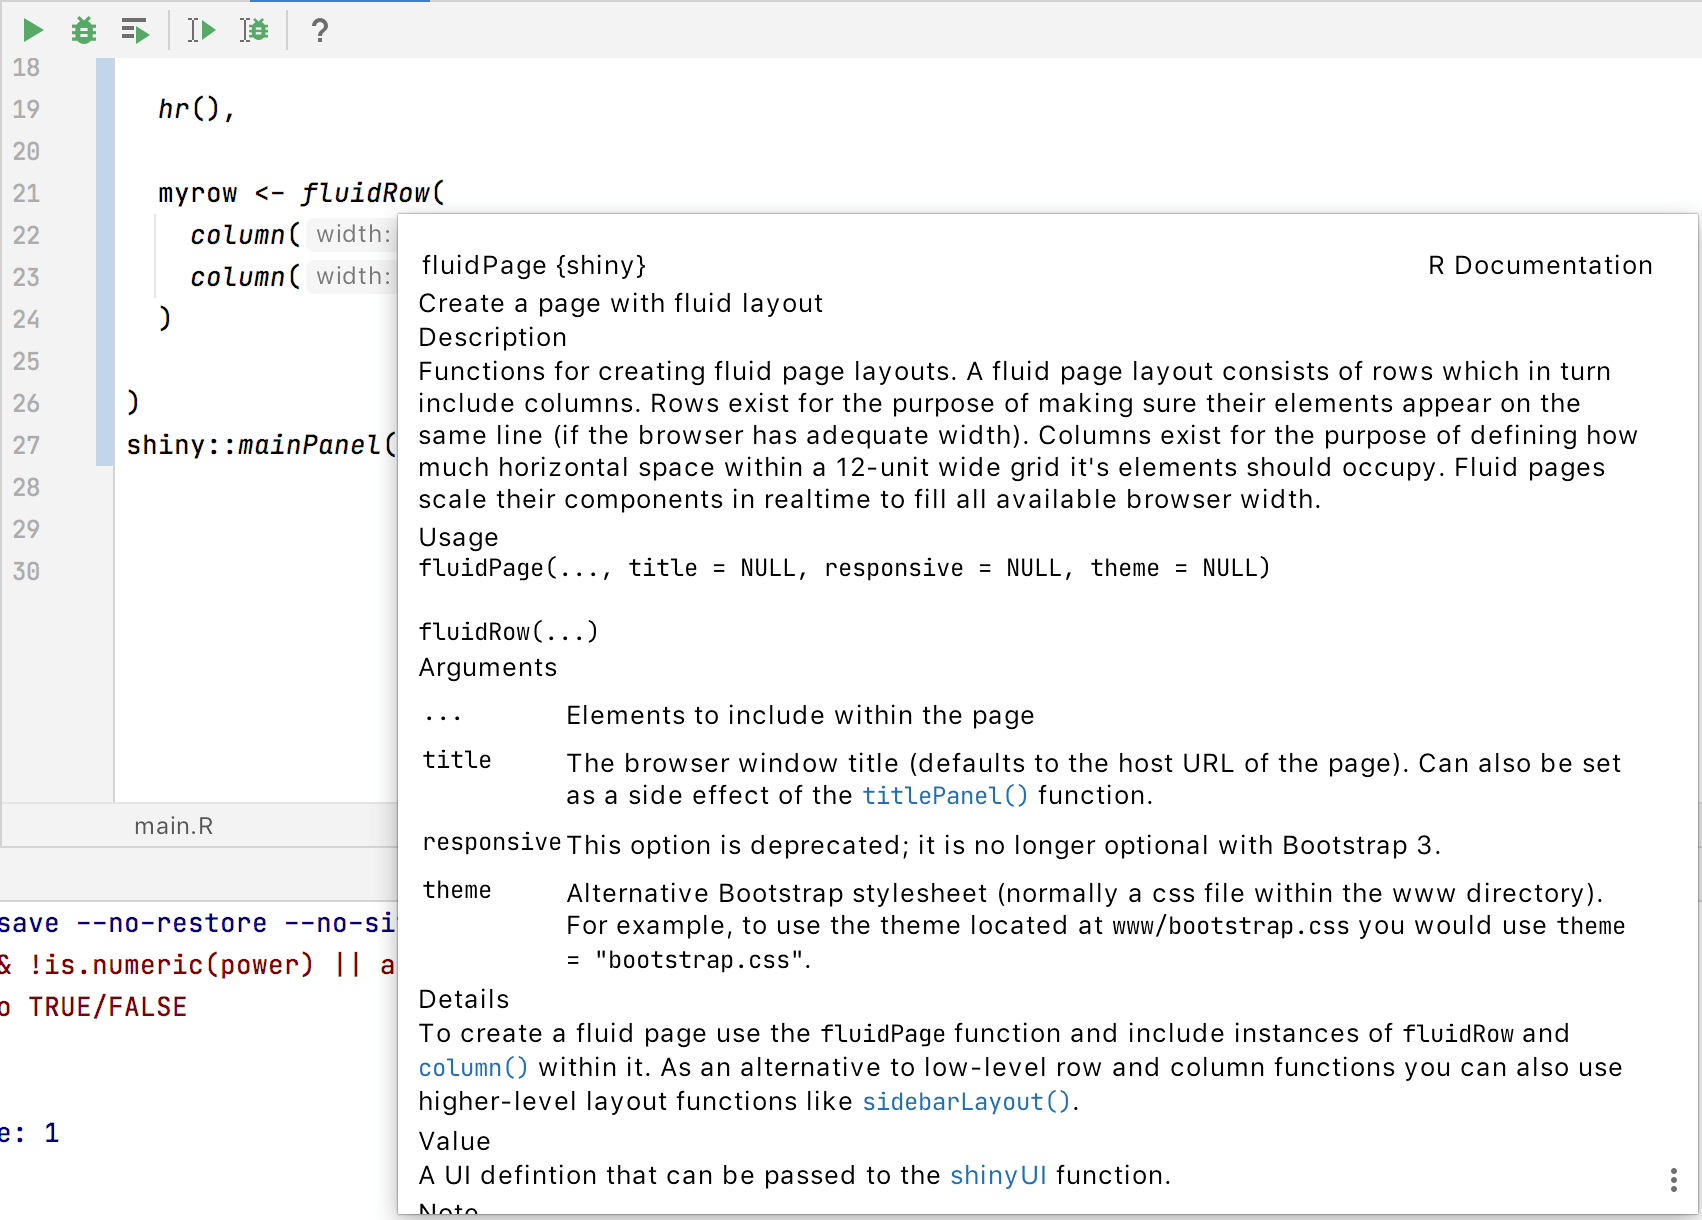 preview R documentation